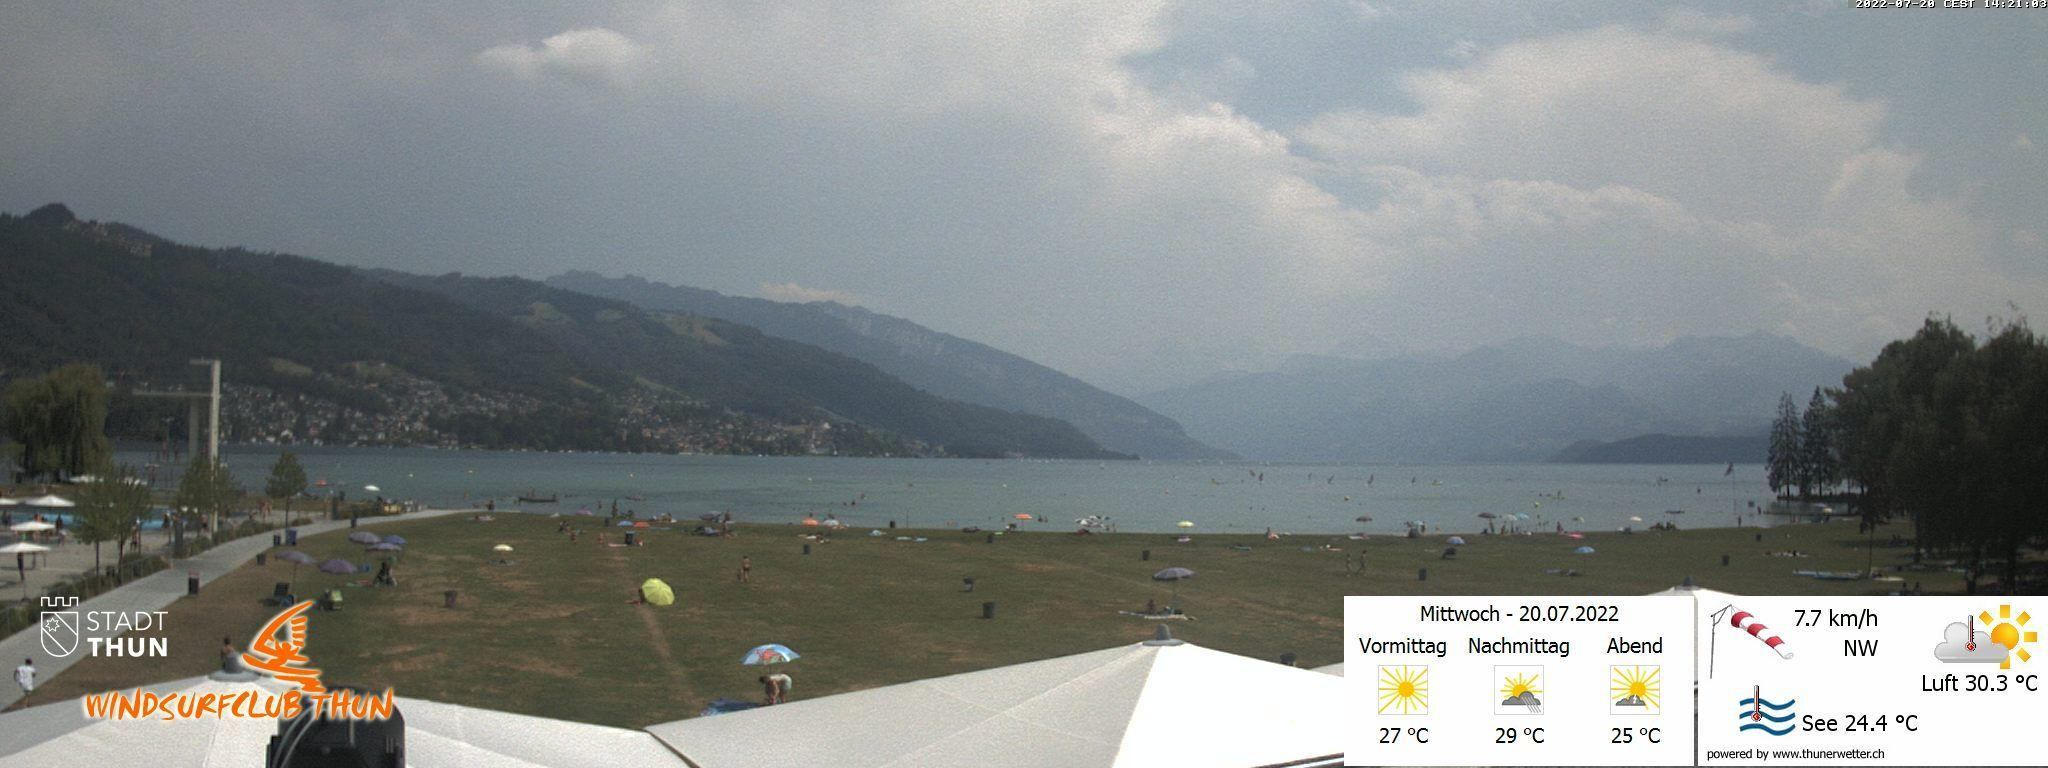 Thun: Webcam des WSCT vom Strandbad